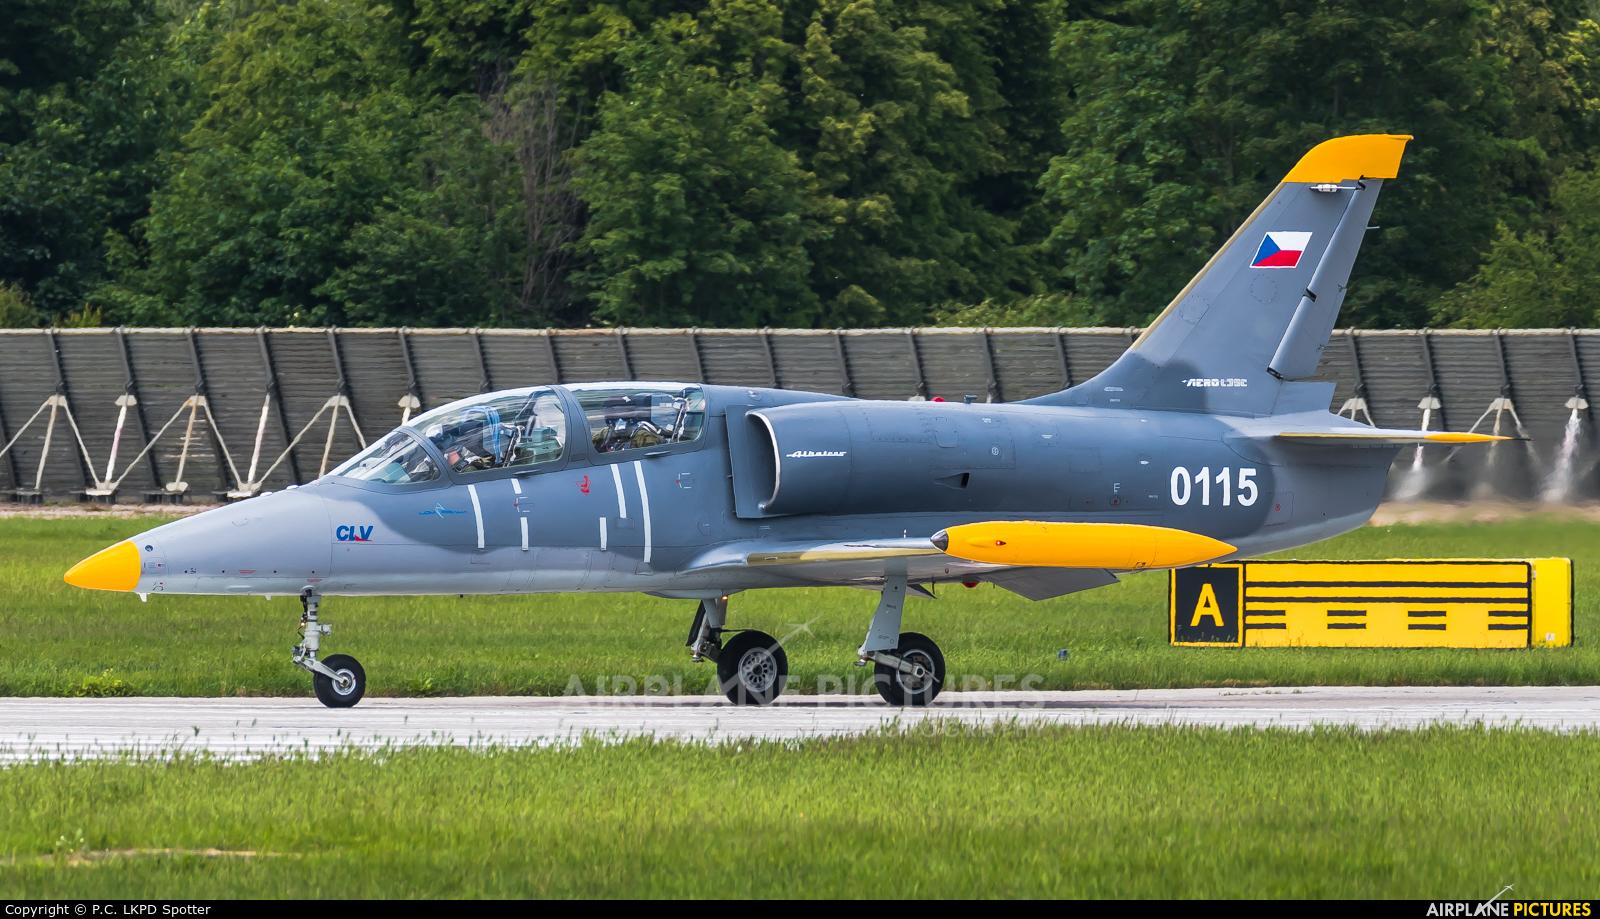 Czech - Air Force 0115 aircraft at Pardubice